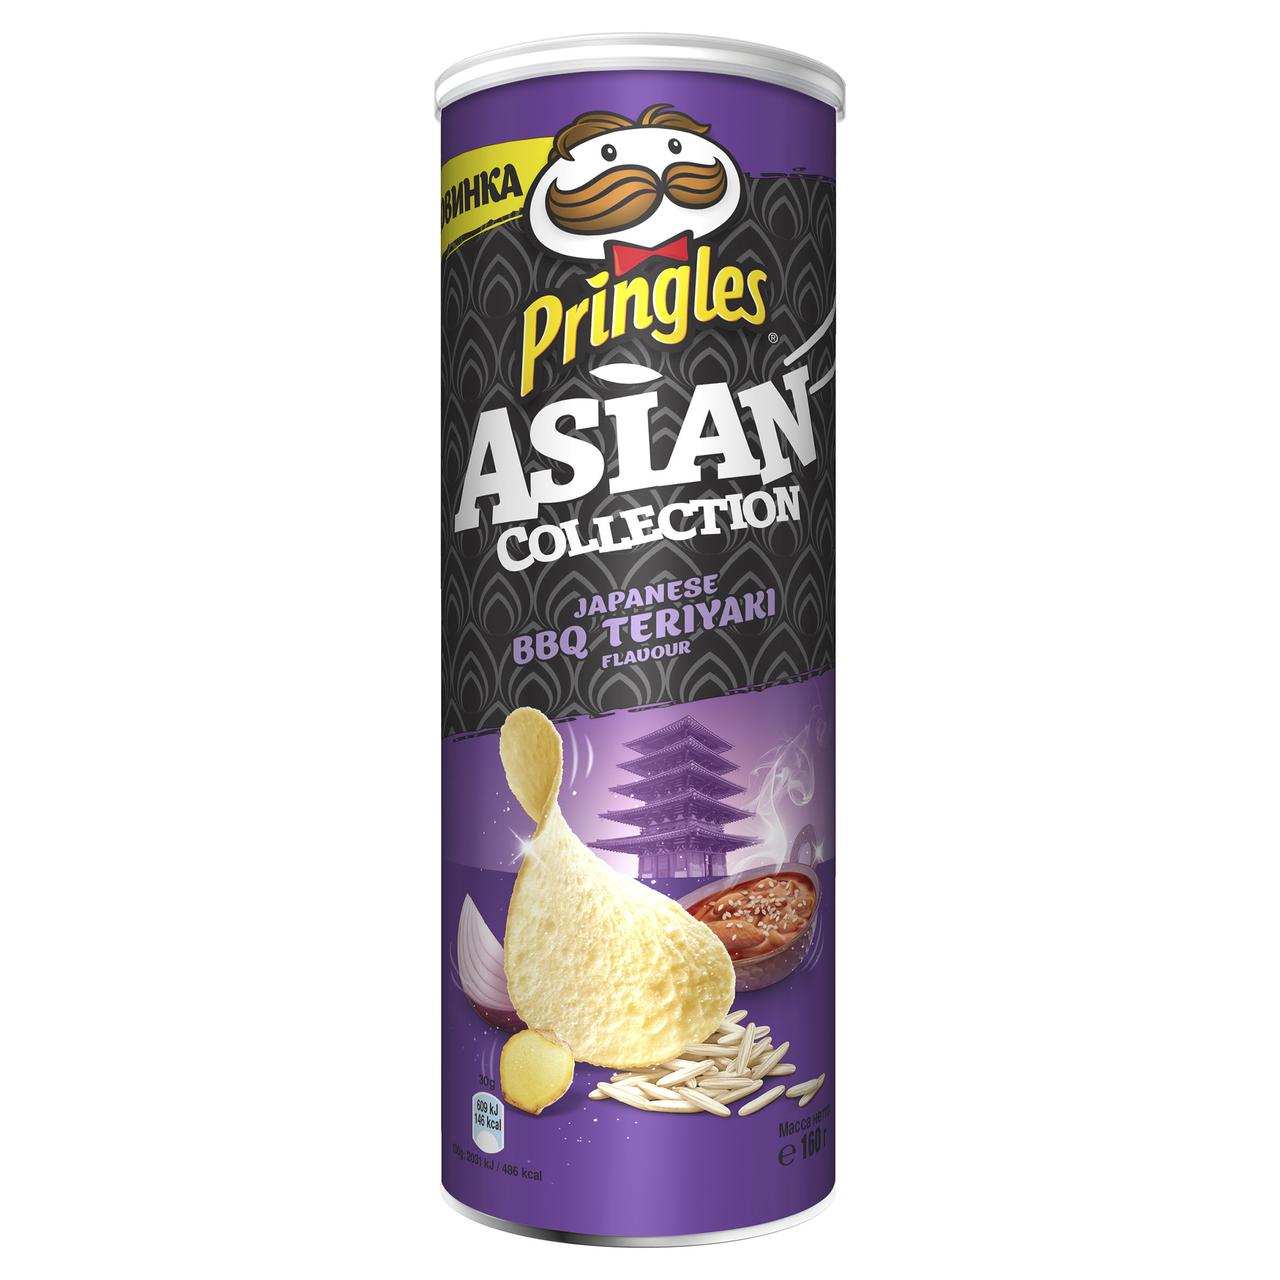 Чіпси Pringles Asian collection Japanese BBQ Teriyaki 160г